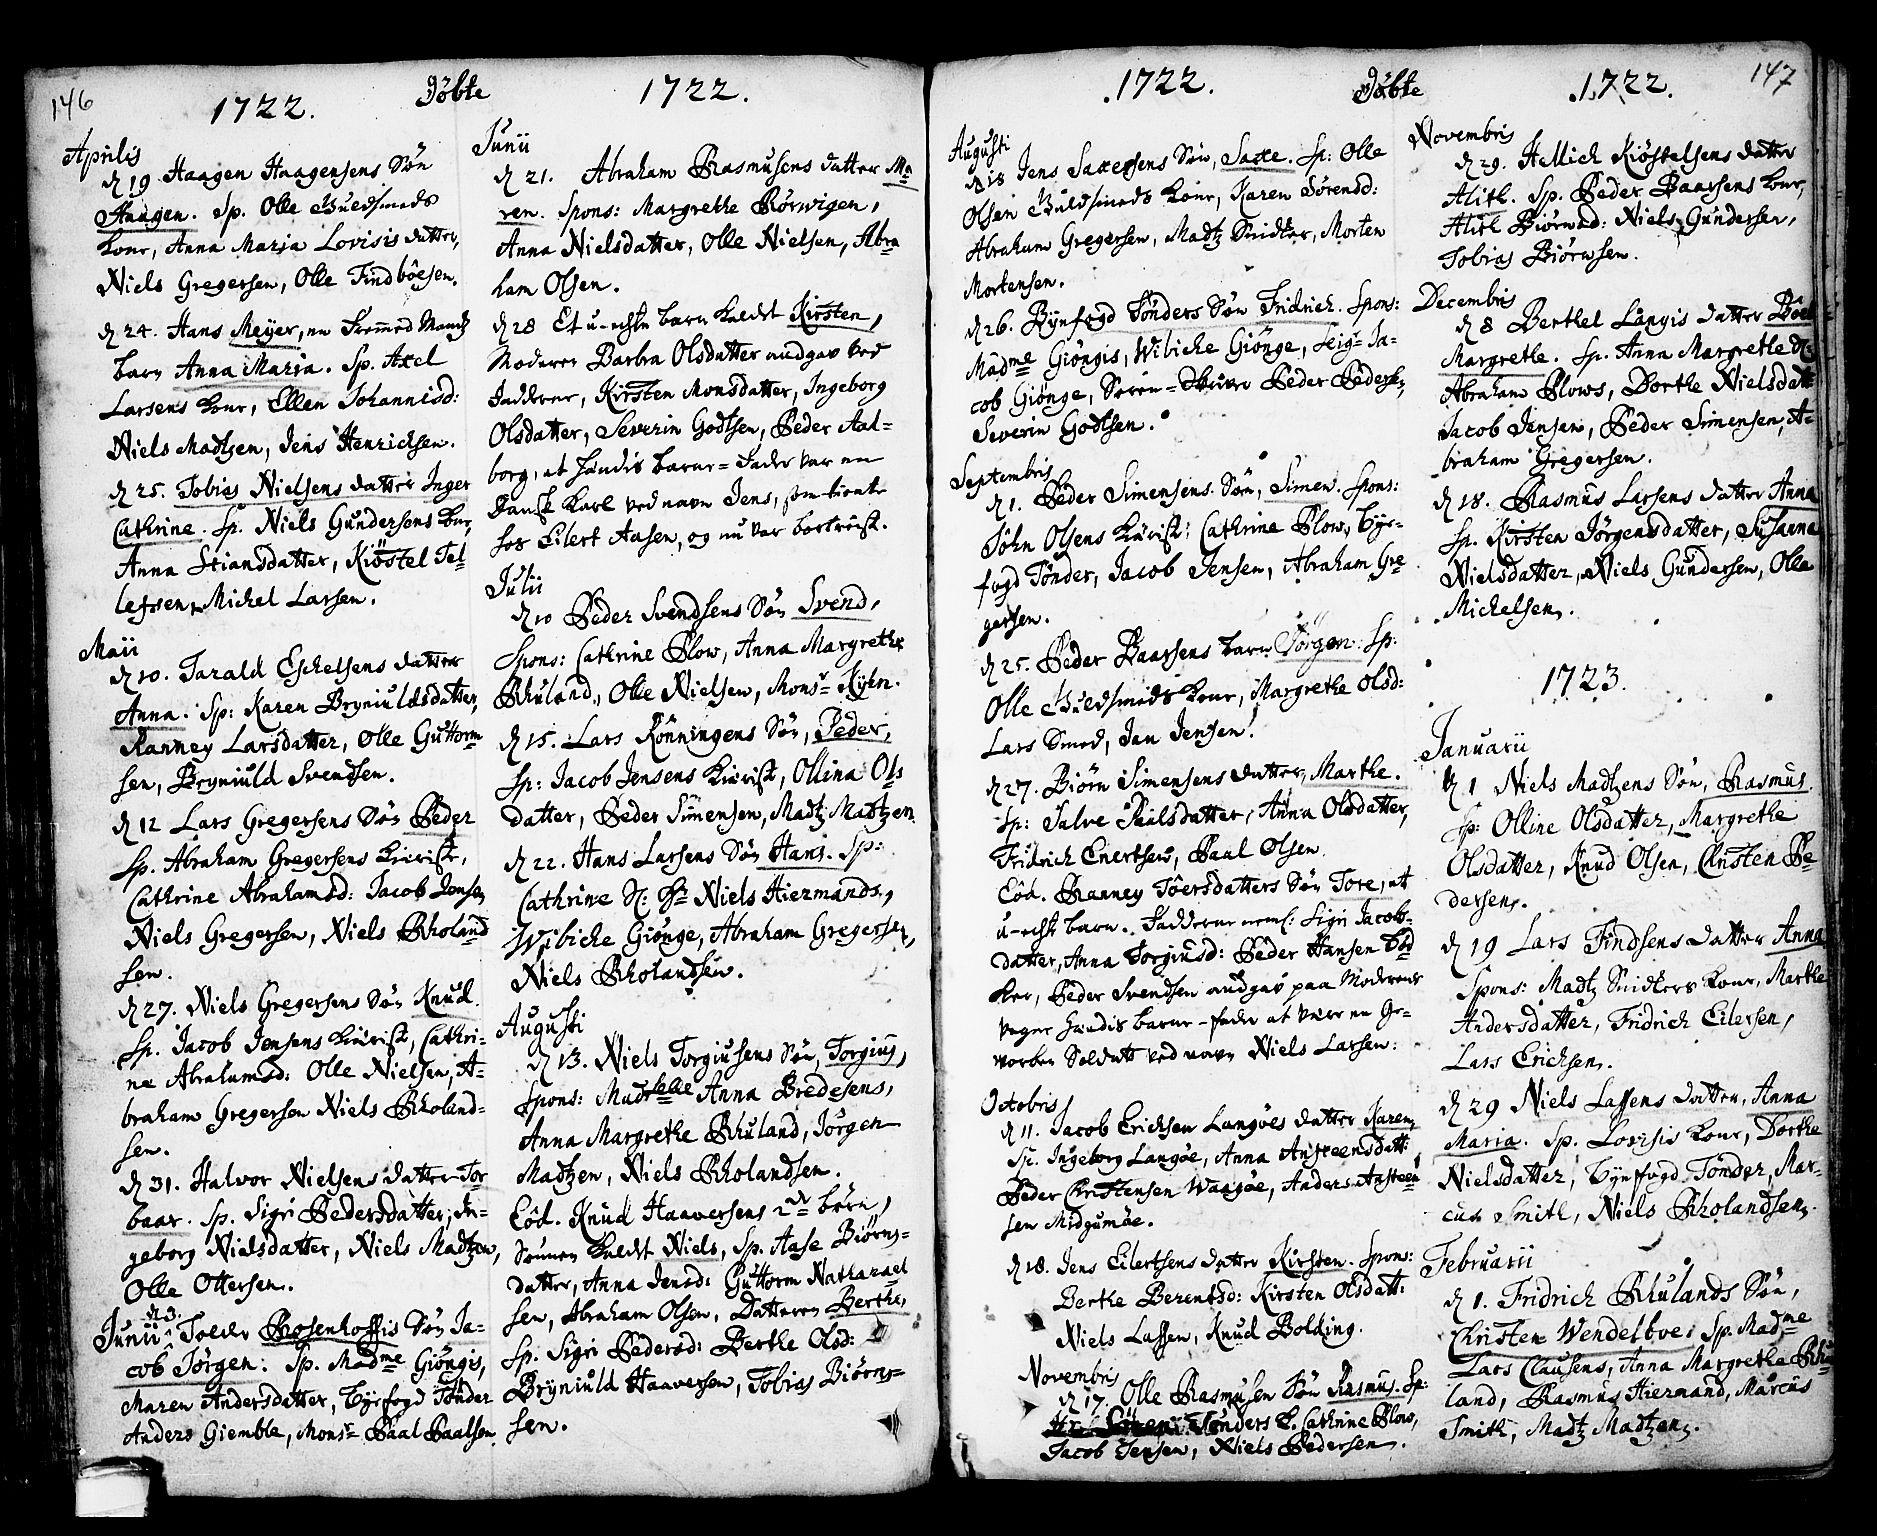 SAKO, Kragerø kirkebøker, F/Fa/L0001: Ministerialbok nr. 1, 1702-1766, s. 146-147